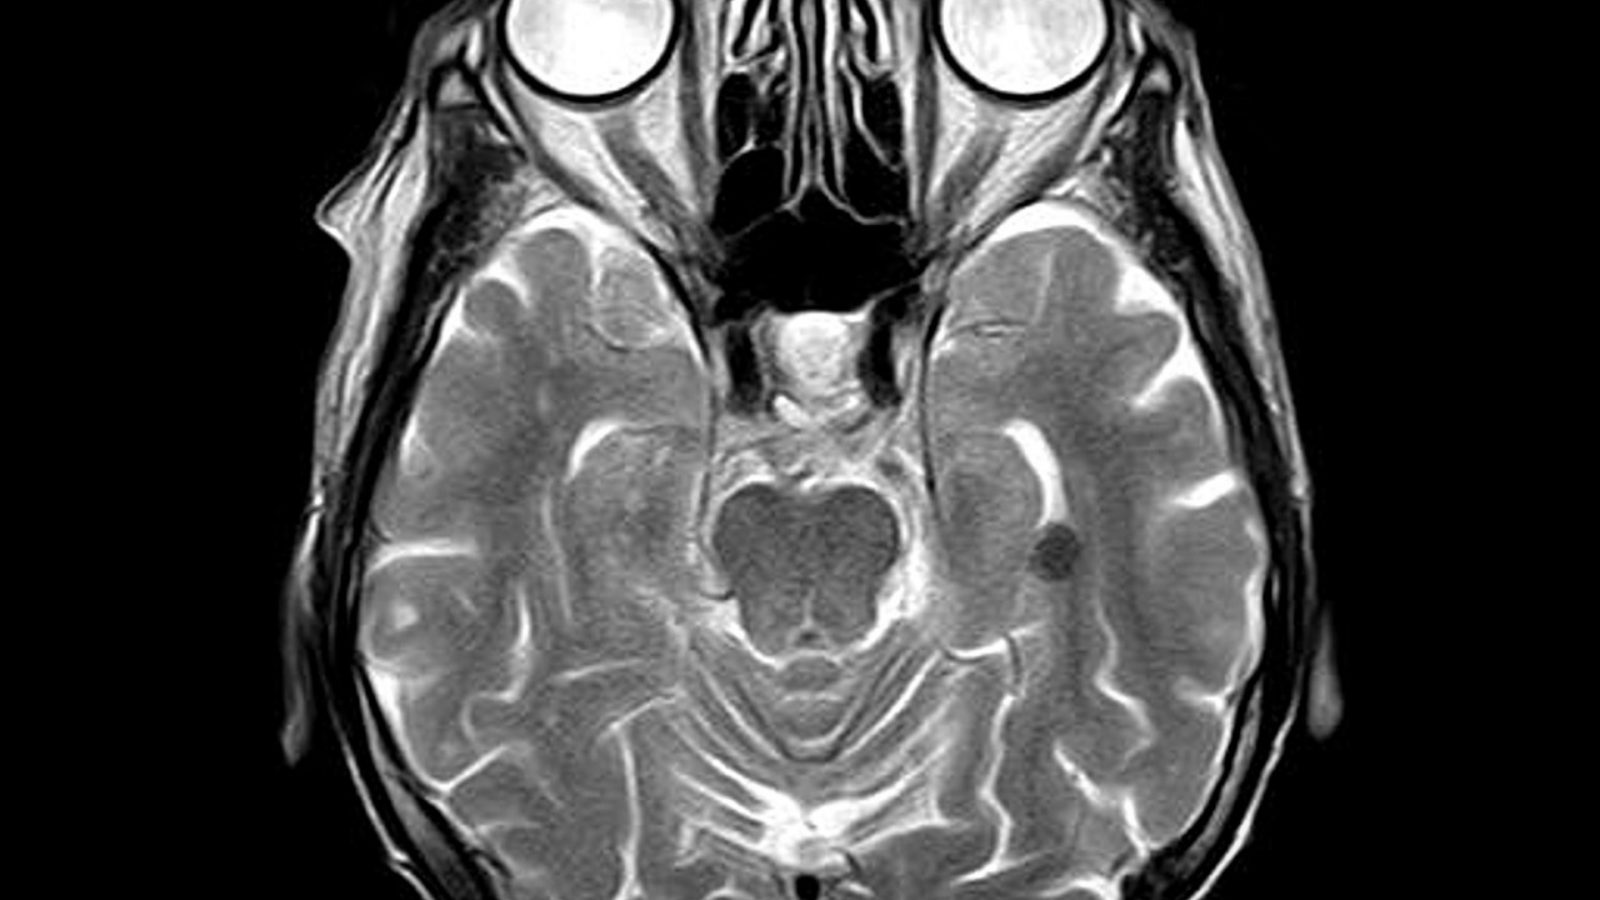 MRI画像は、精神科におけるバイオマーカーになりえるか?【AI×メンタルヘルス】(論文解説)